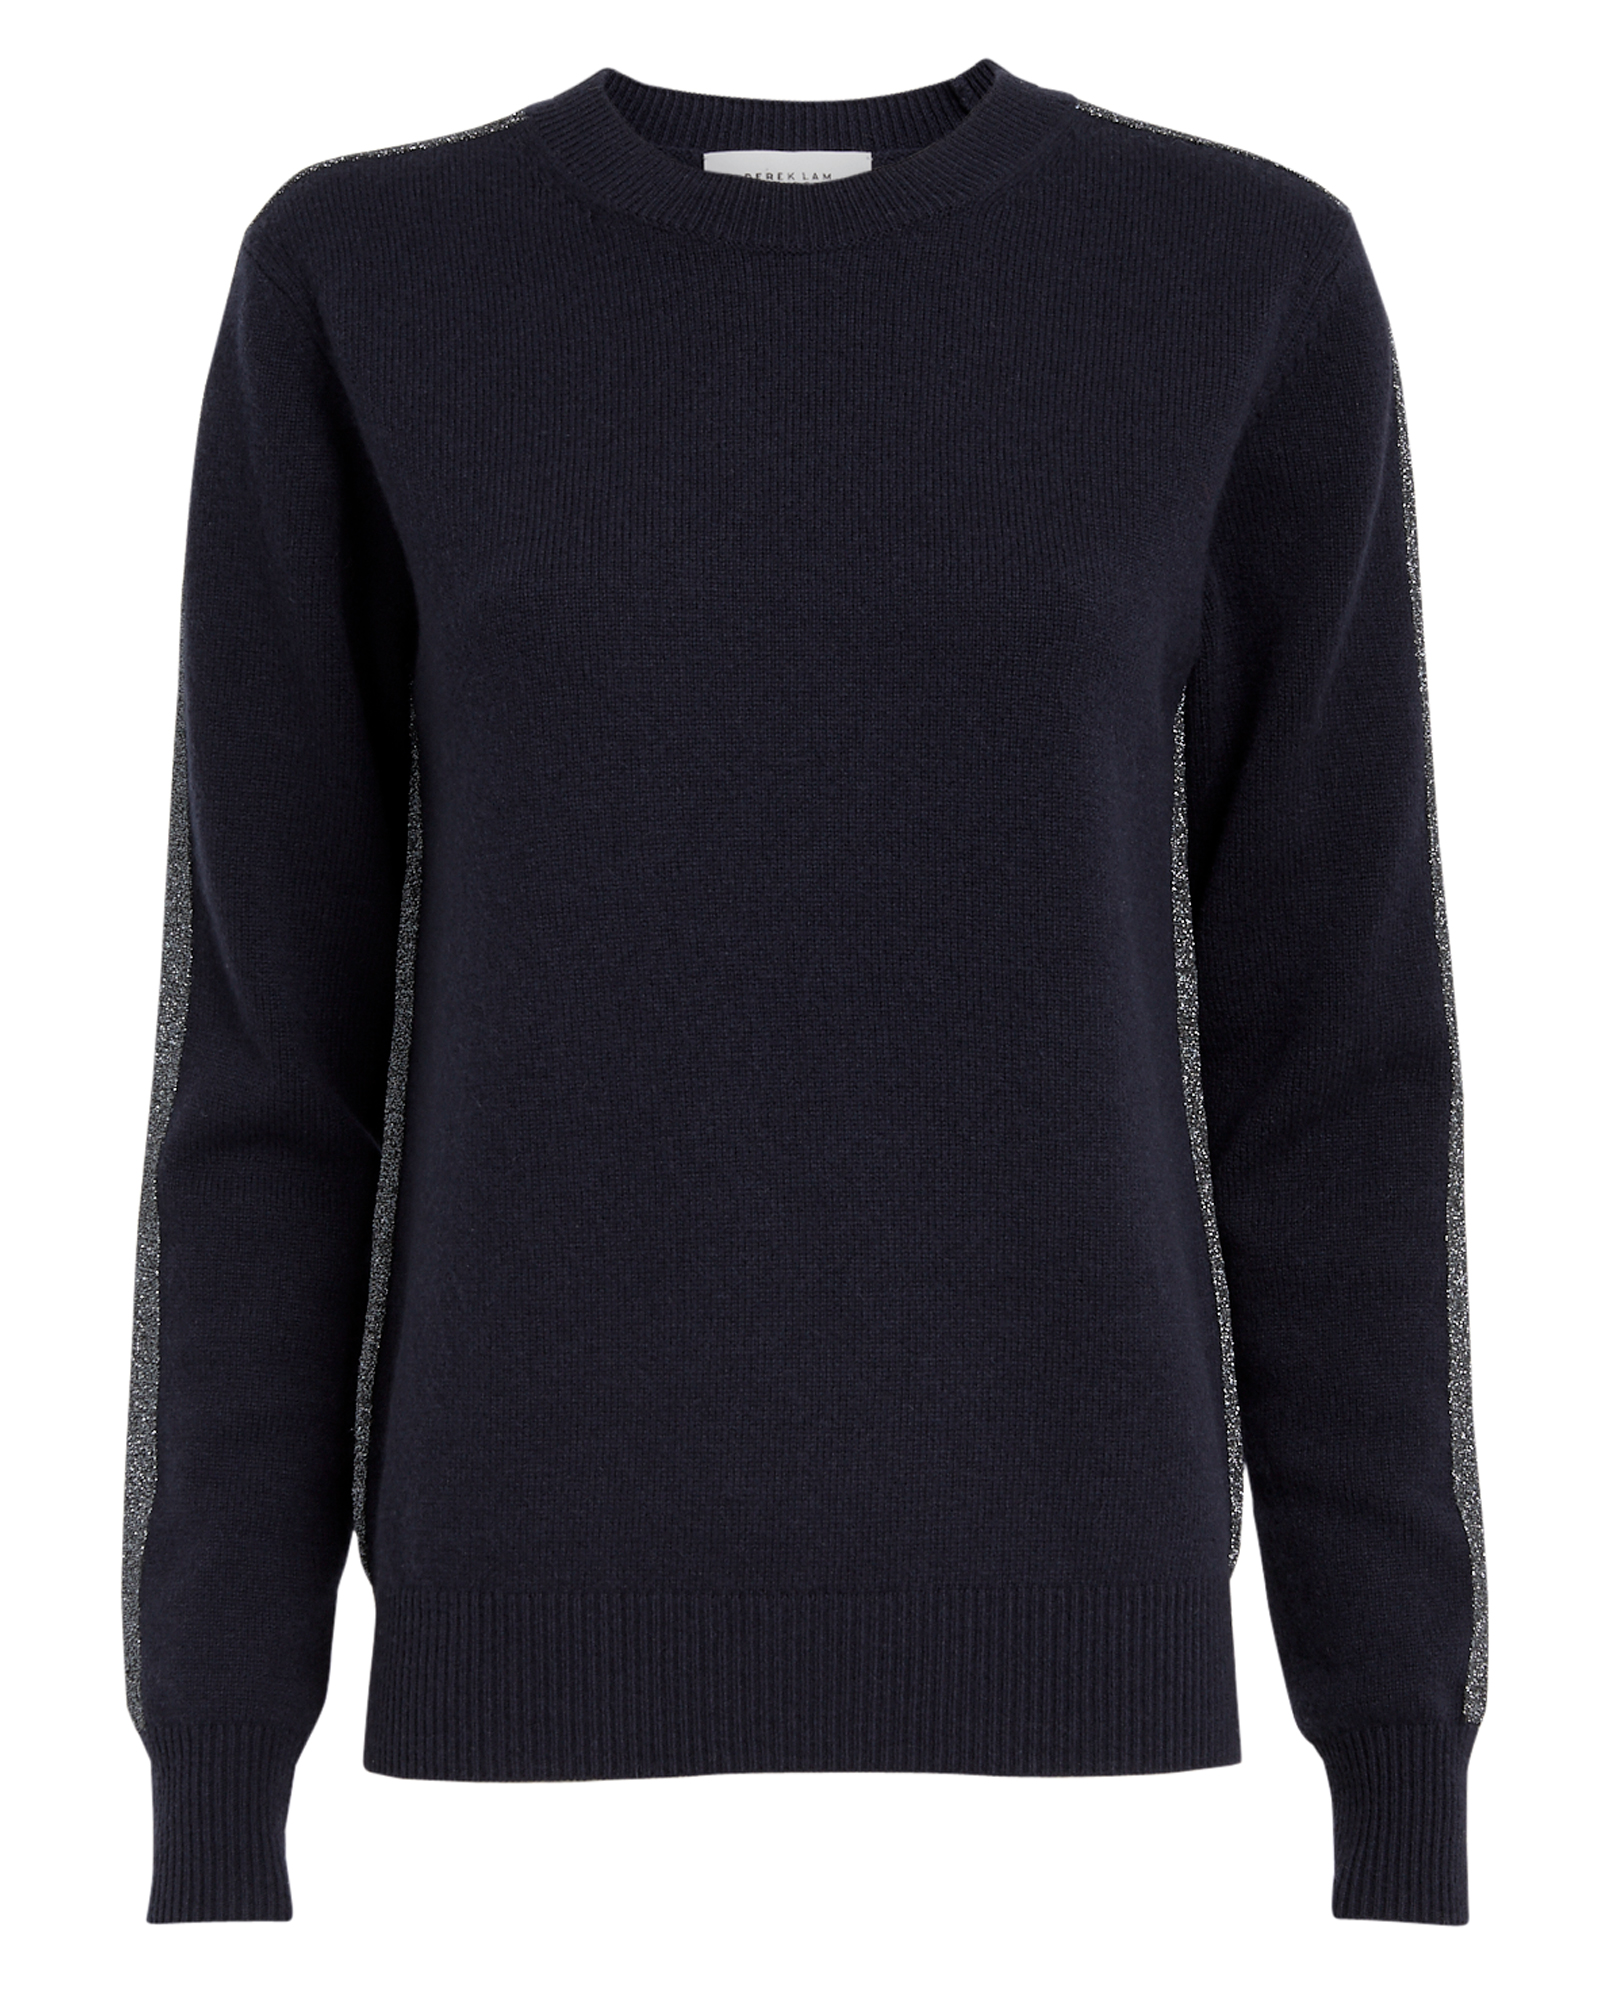 10 CROSBY Lurex Striped Navy Cashmere Sweater